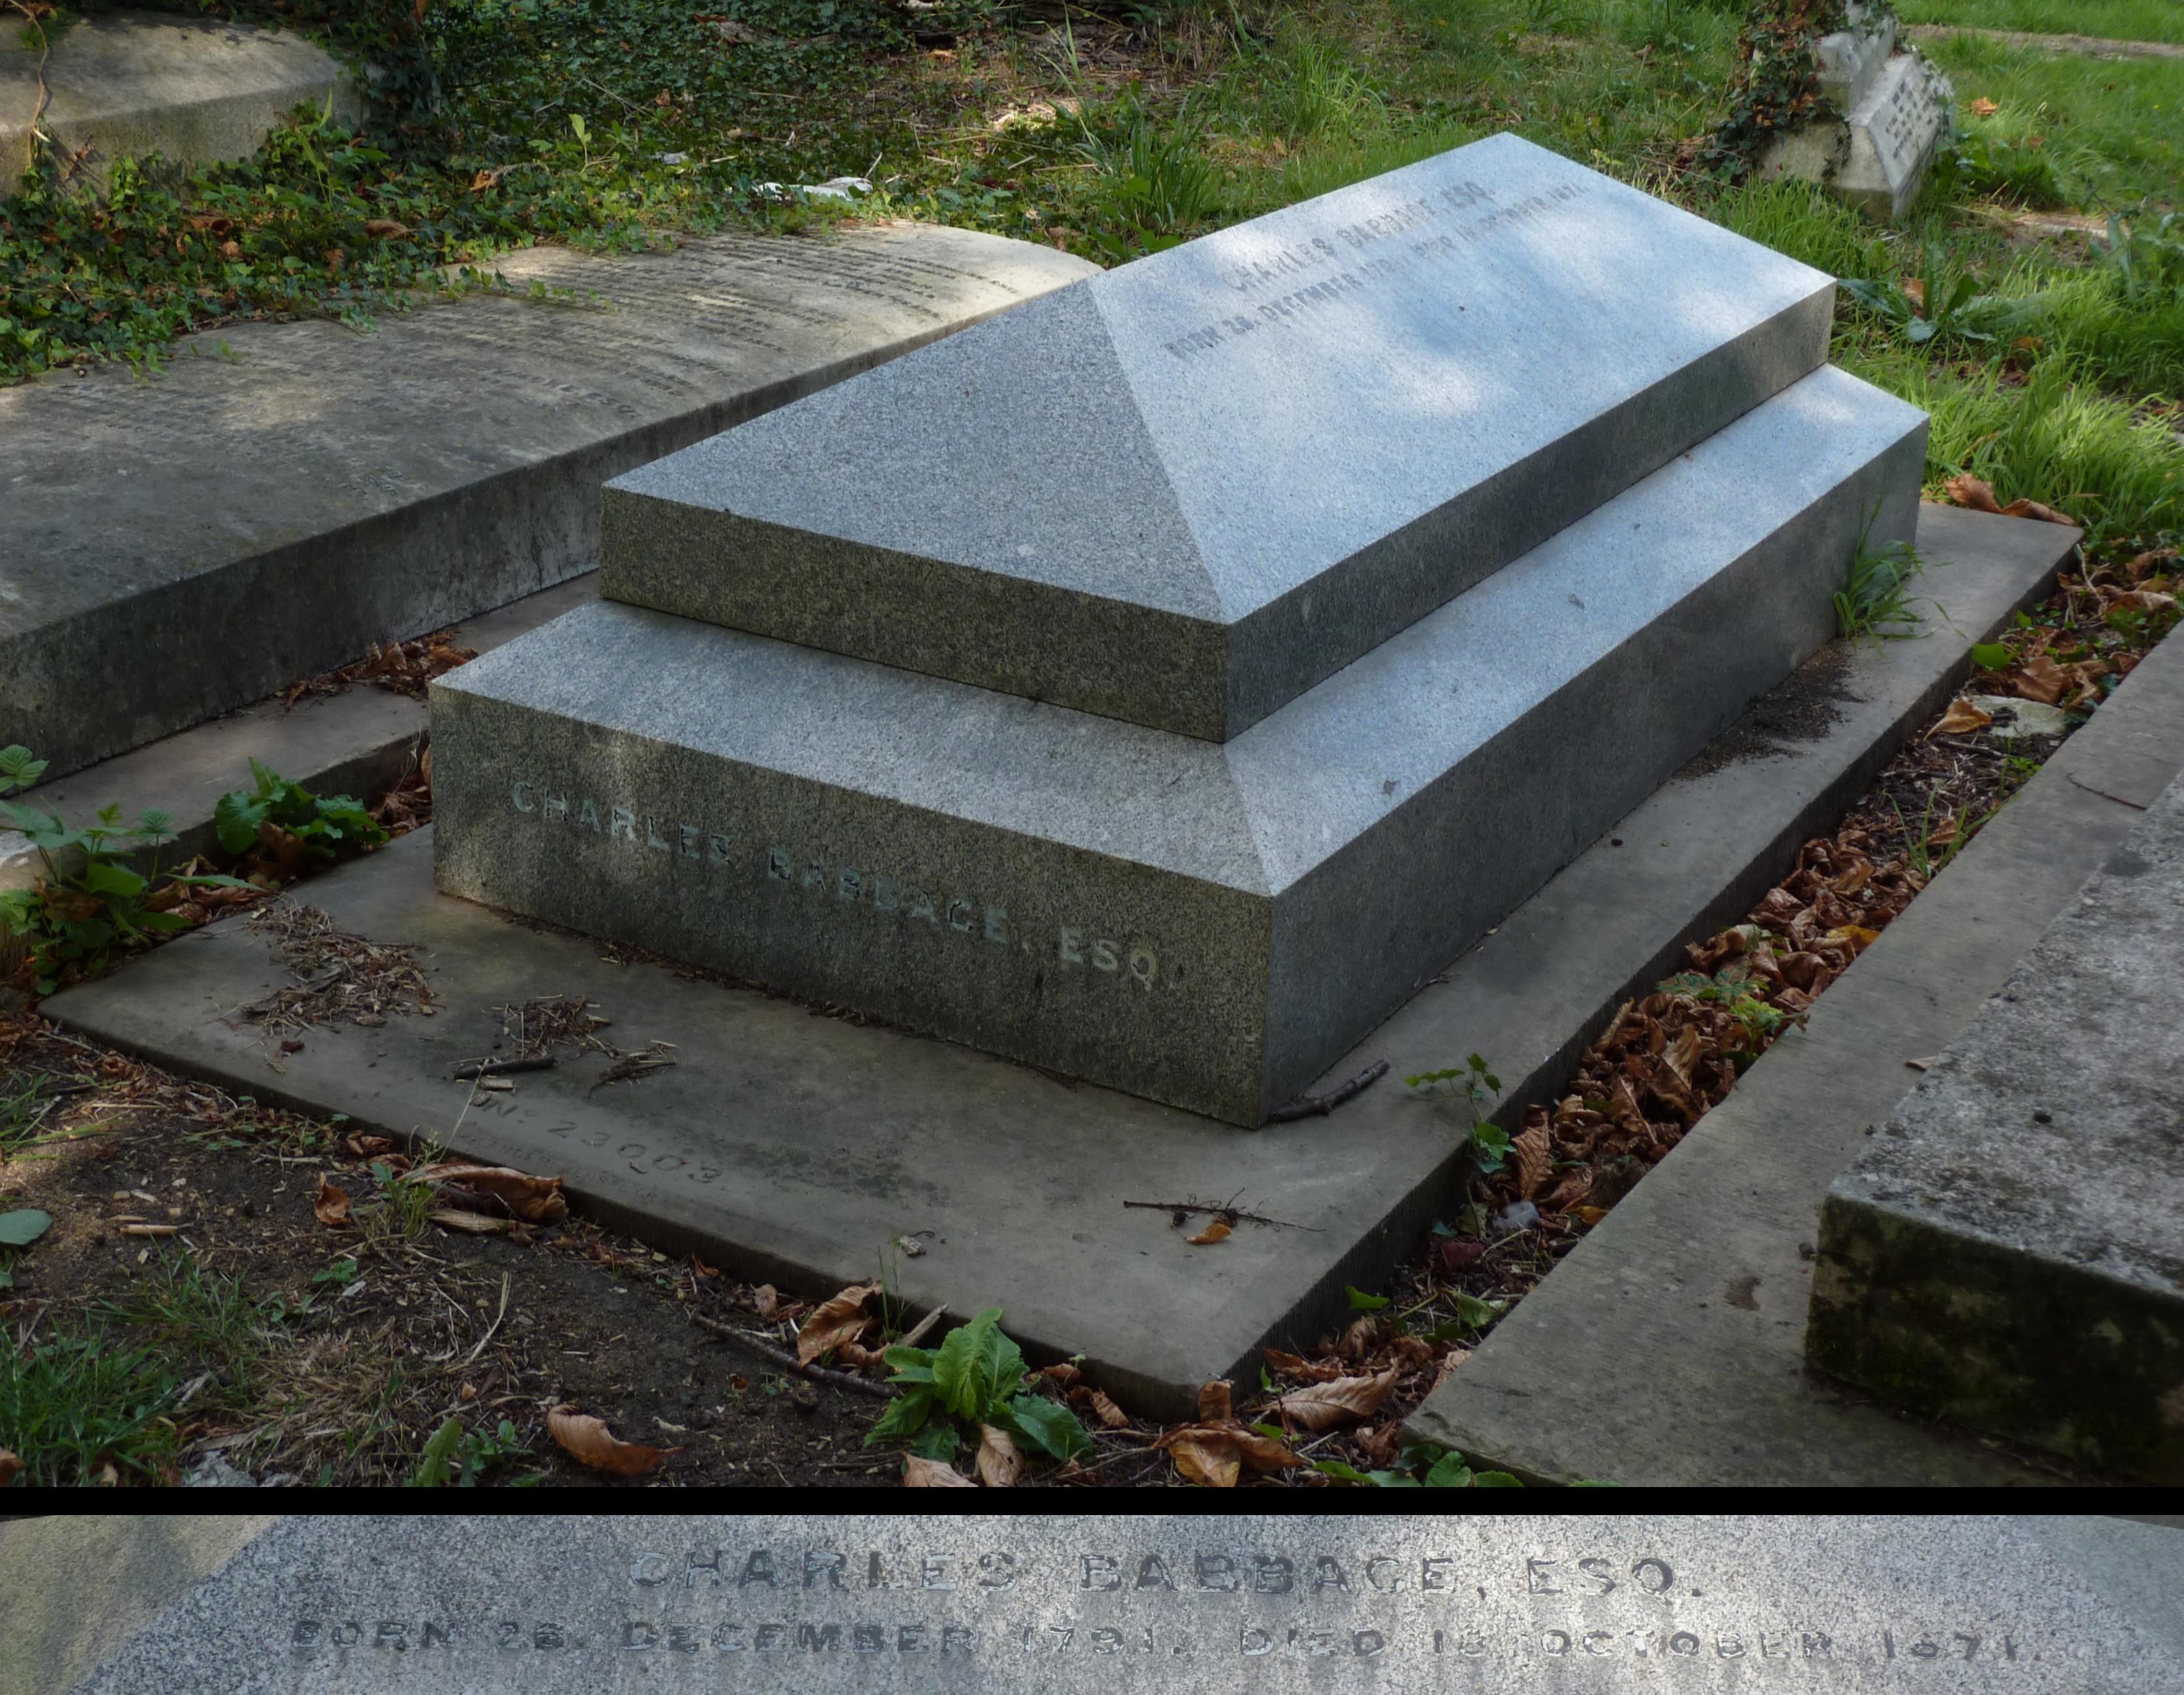 File:Charles Babbage grave Kensal Green 2014.jpg - Wikimedia Commons